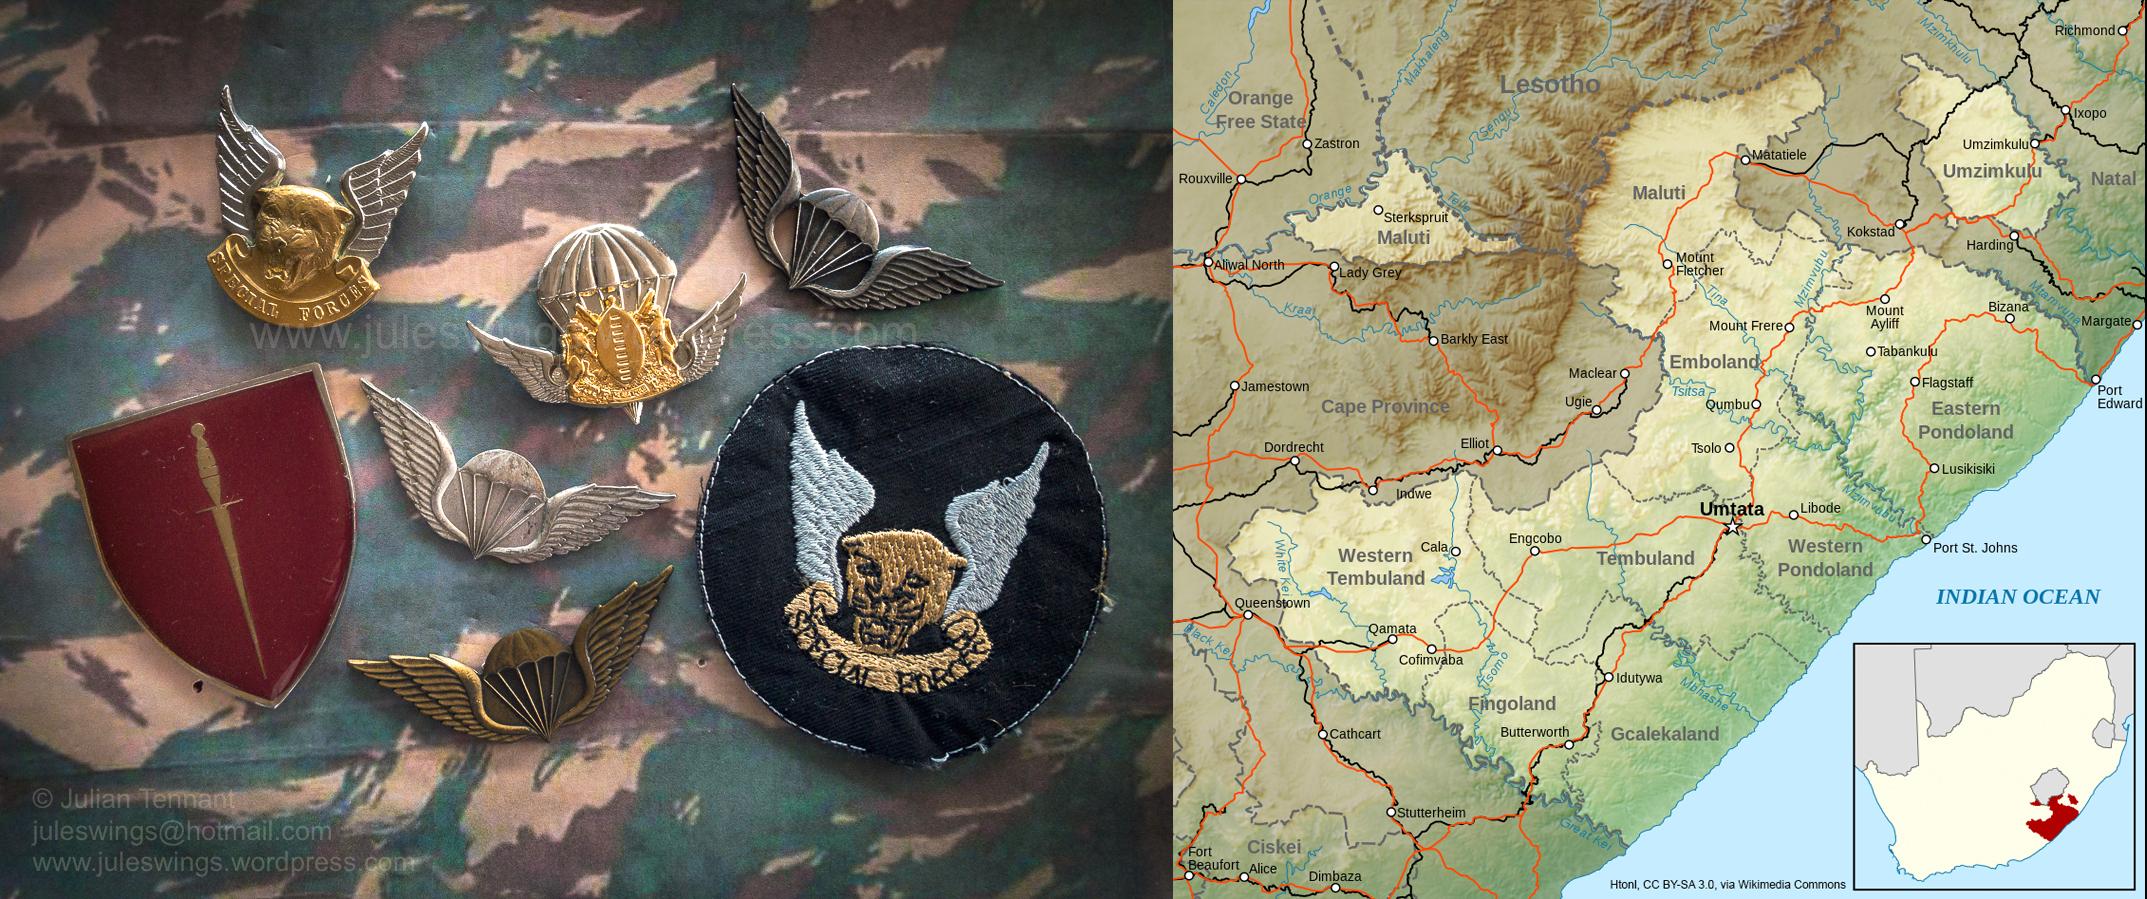 transkei airborne insignia juleswings map